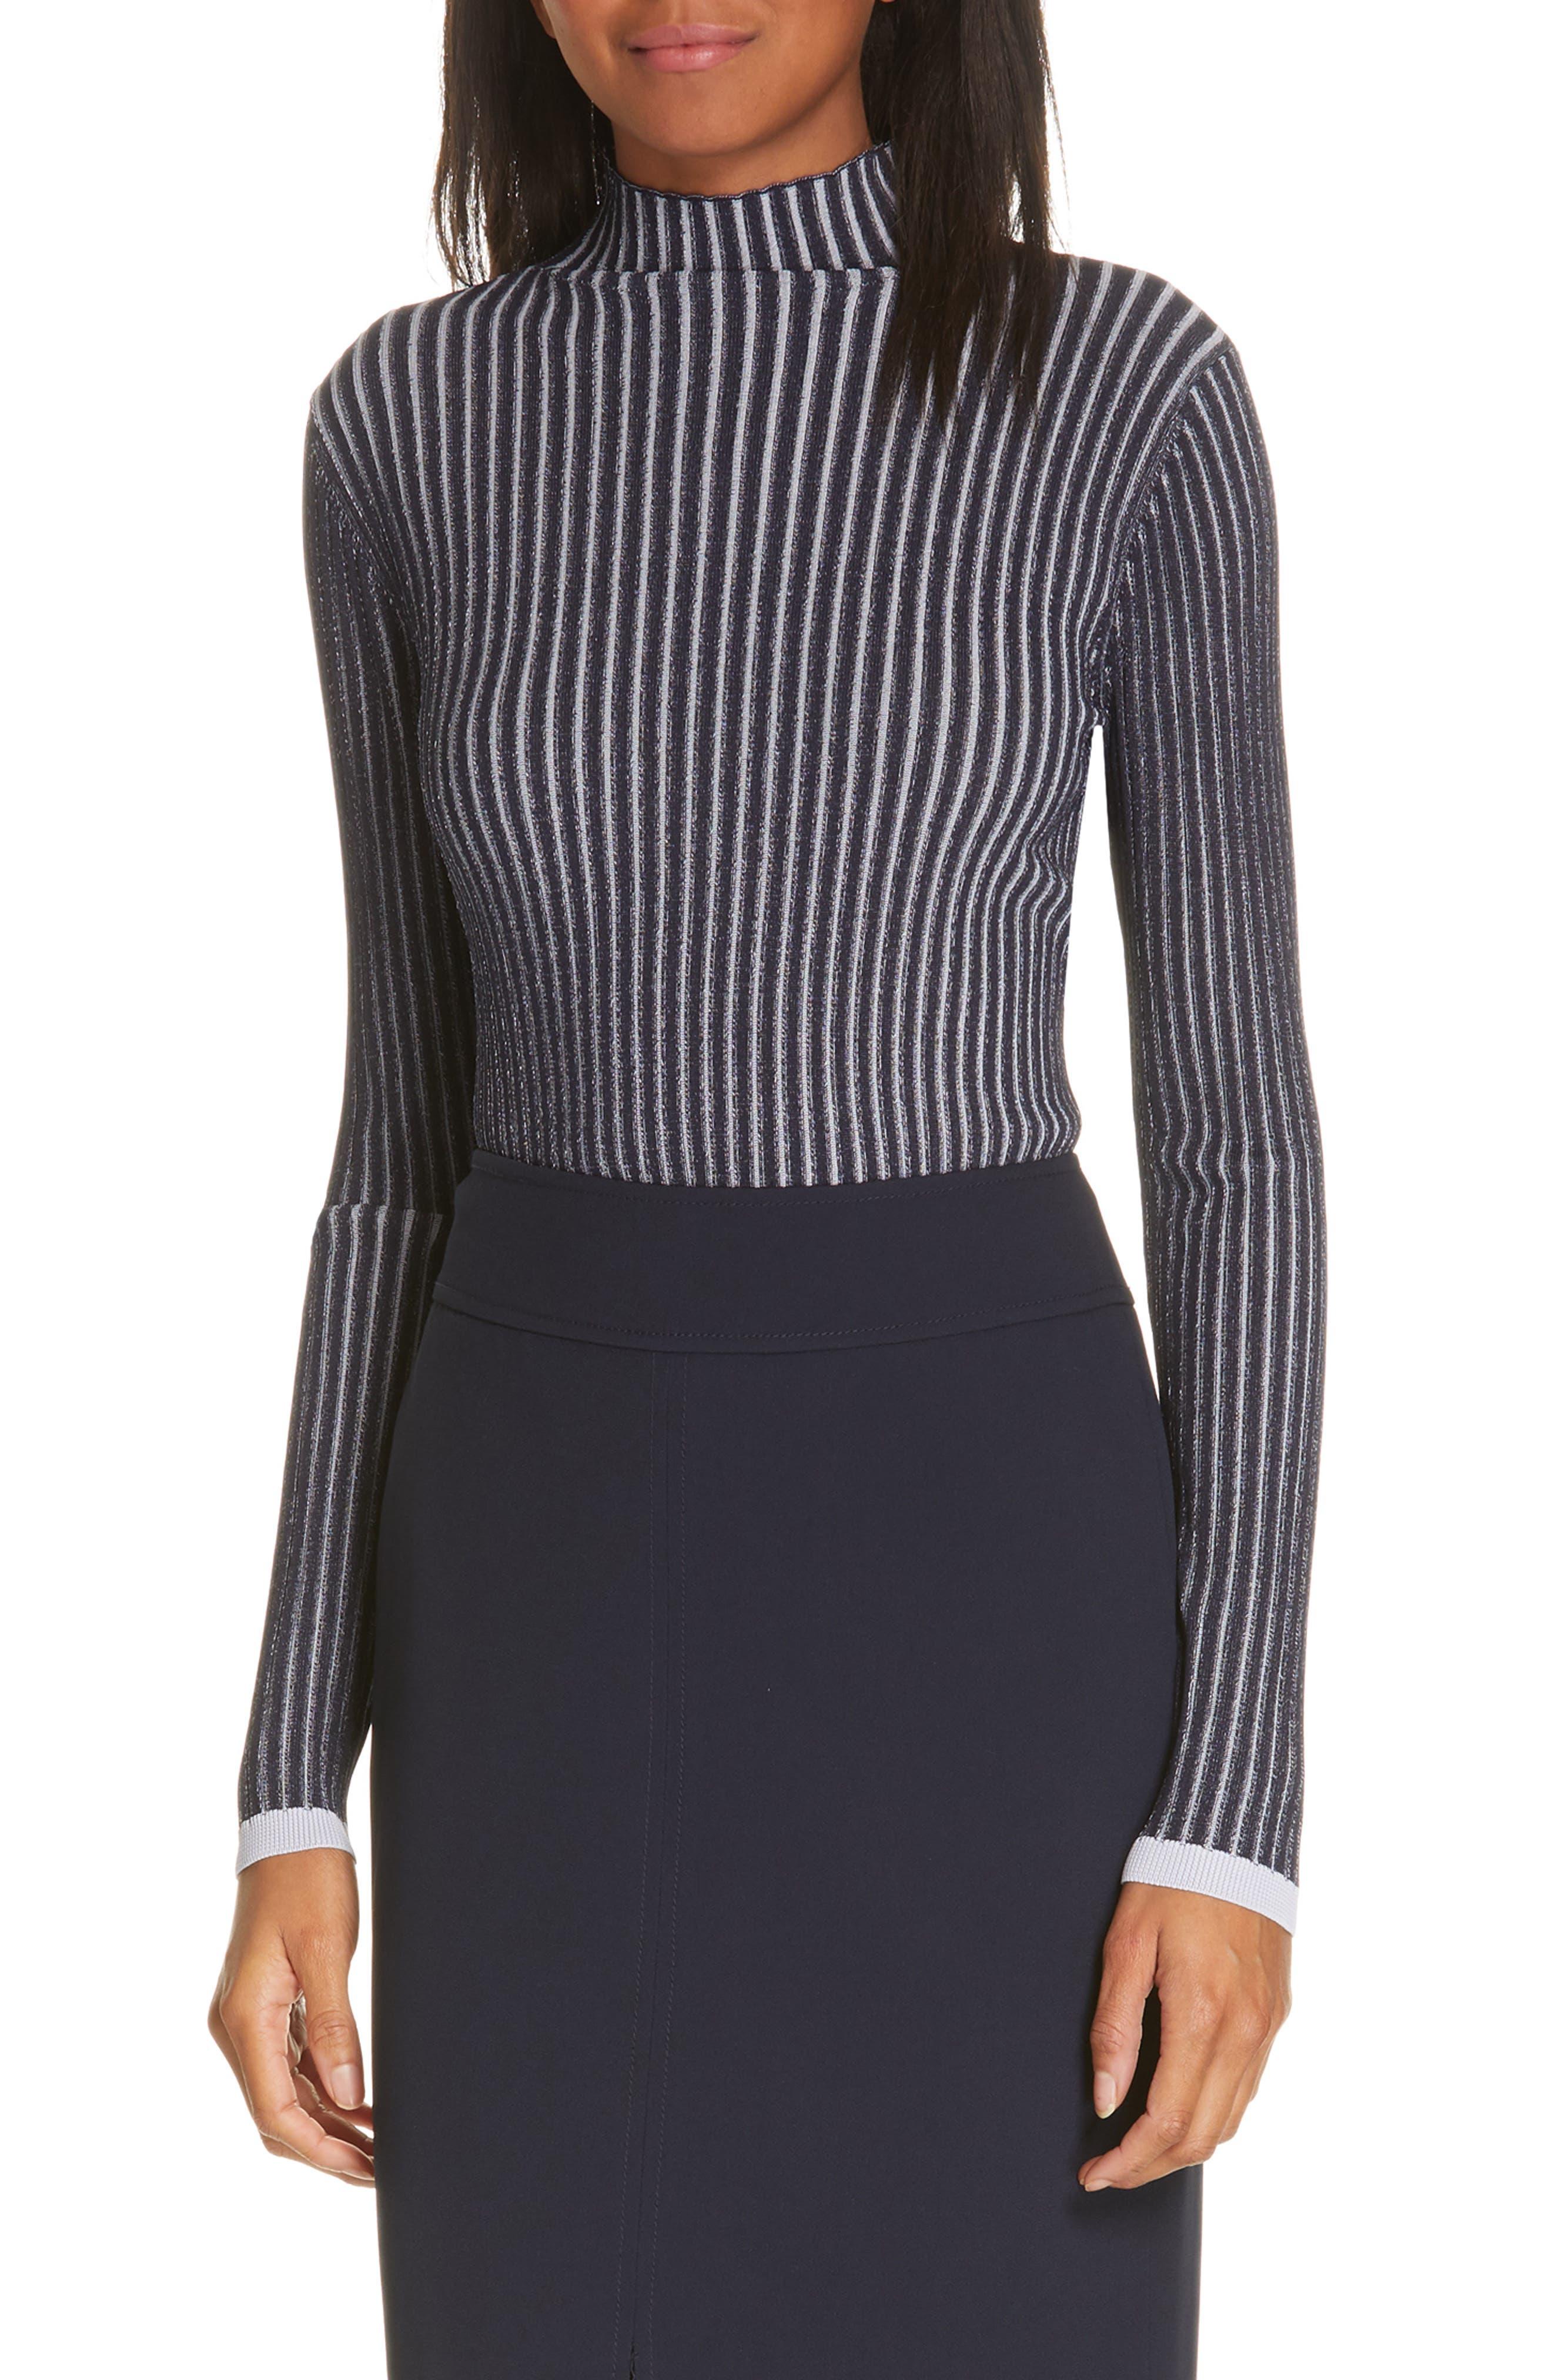 LEWIT, Stripe Ribbed Mock Neck Sweater, Main thumbnail 1, color, NAVY ICELANDIC STRIPE